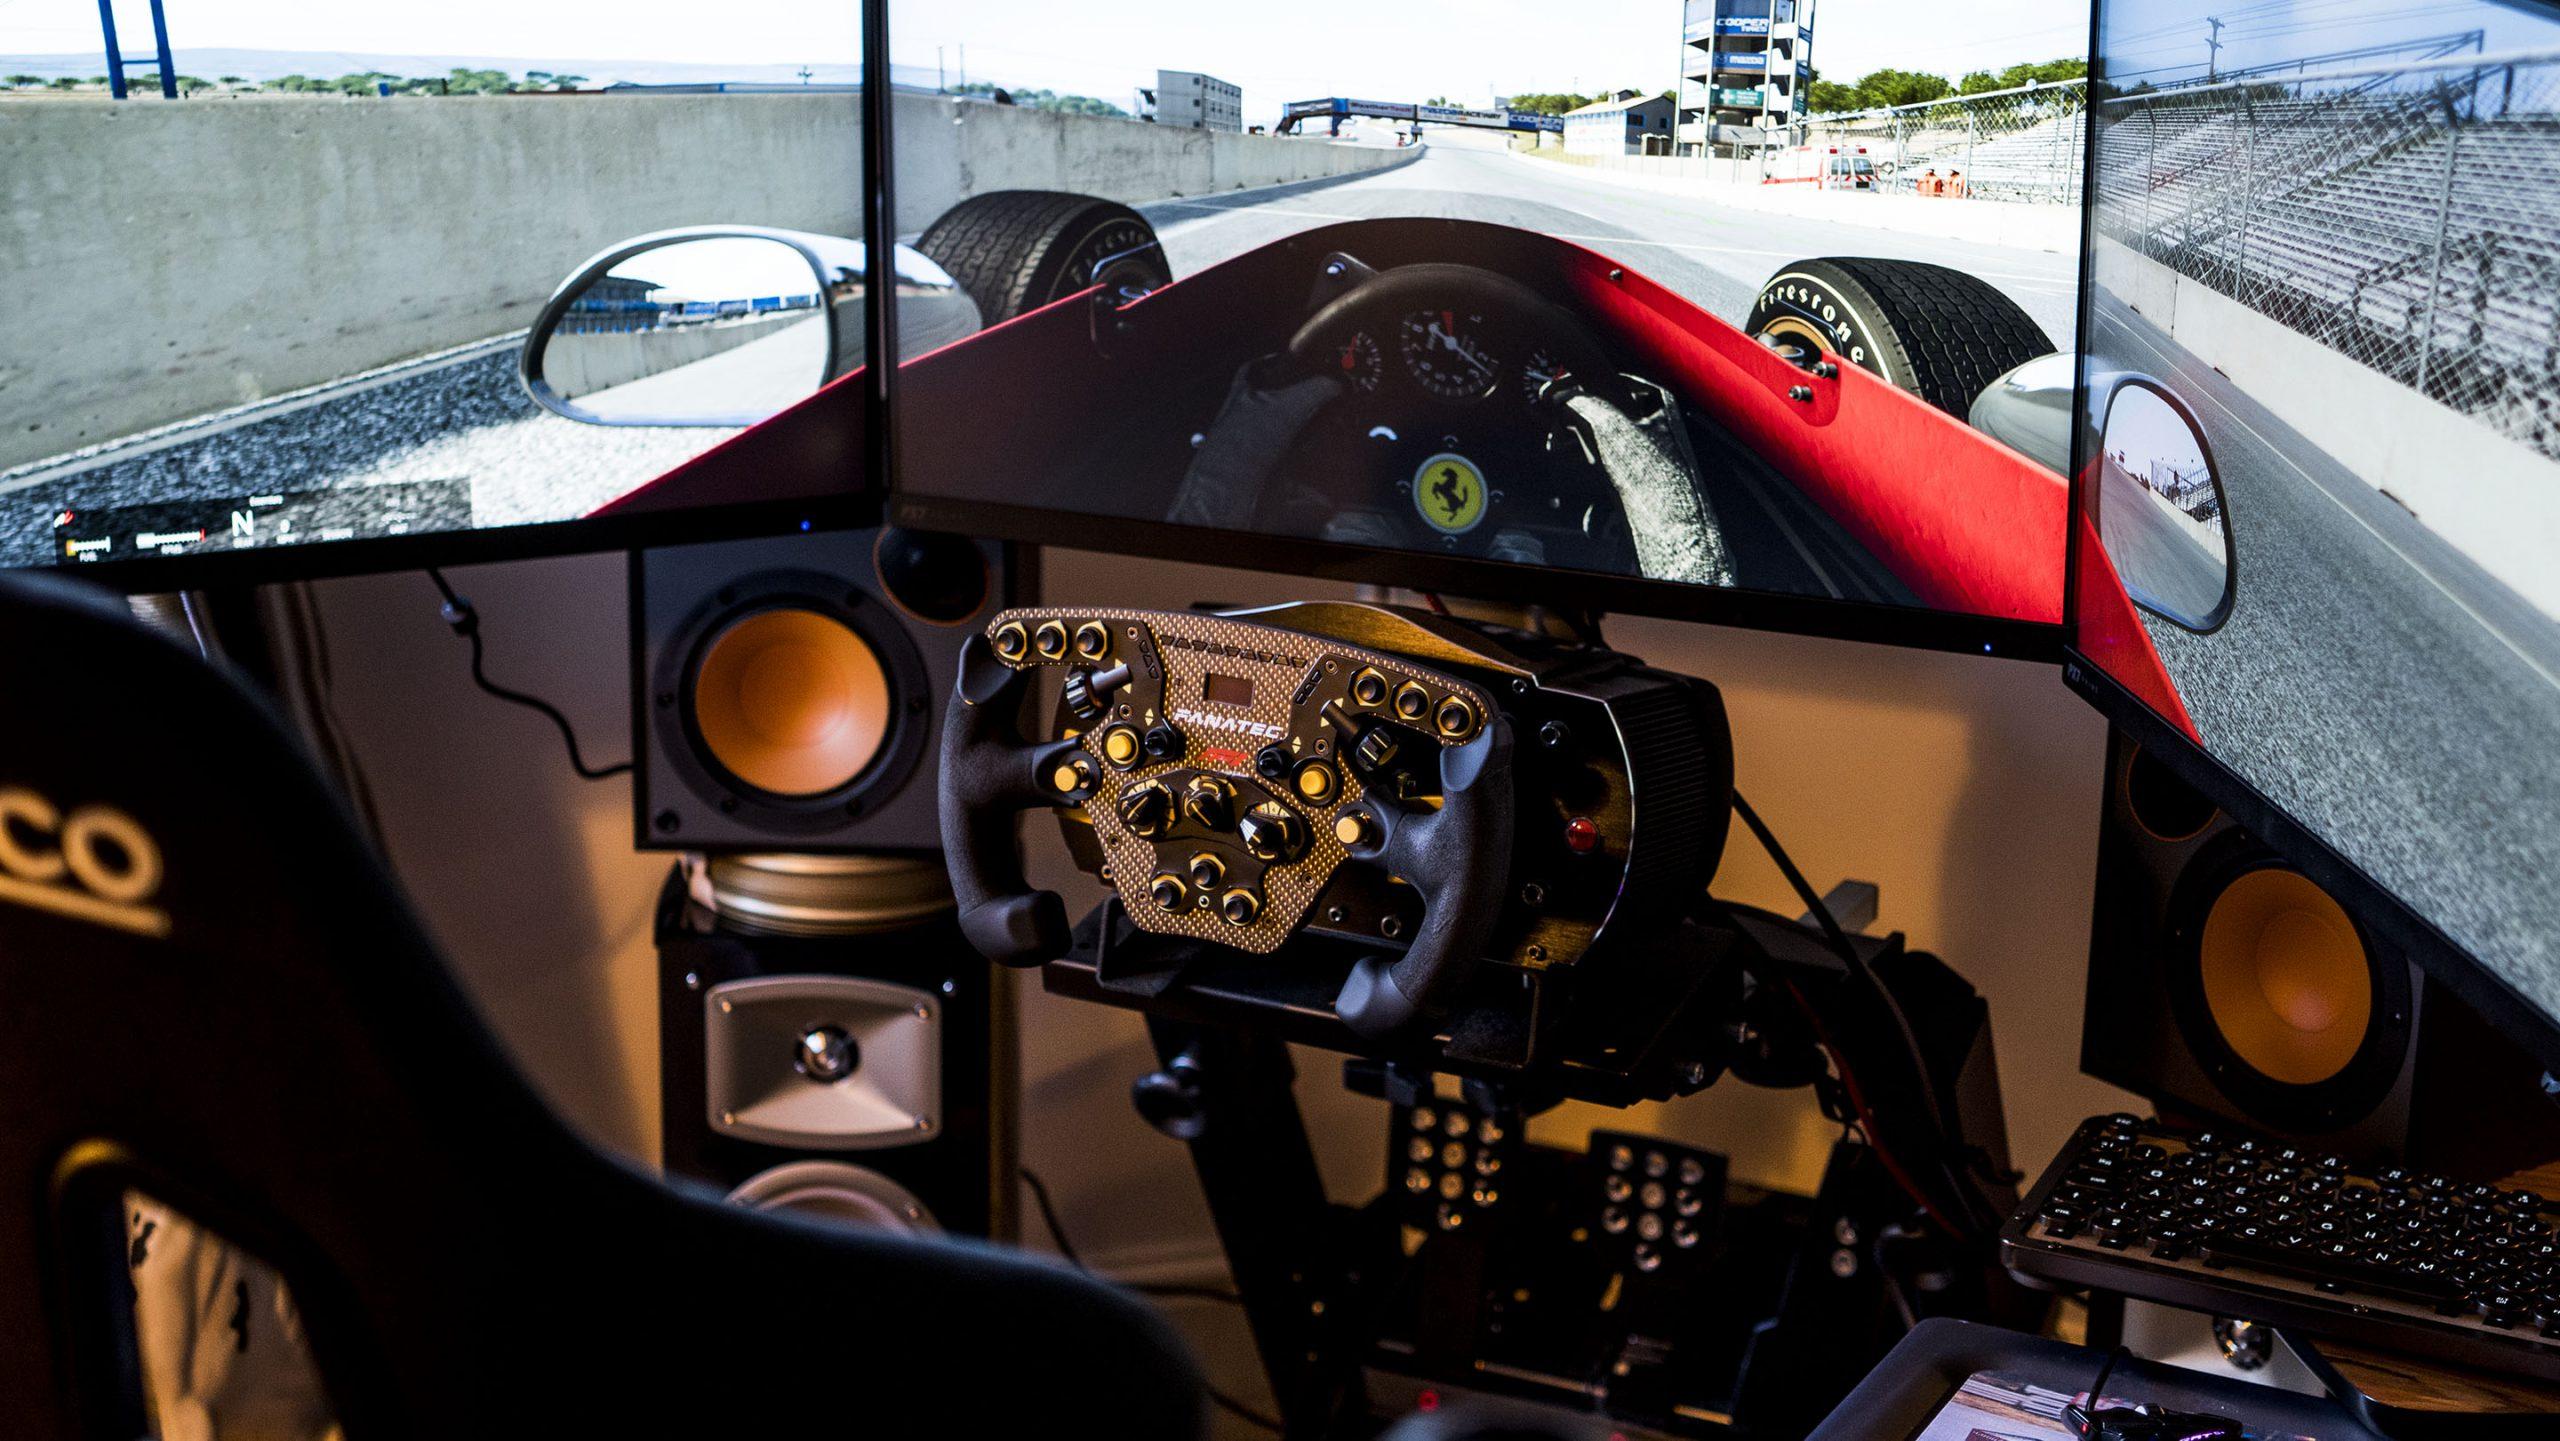 EOSHD F1 racing sim